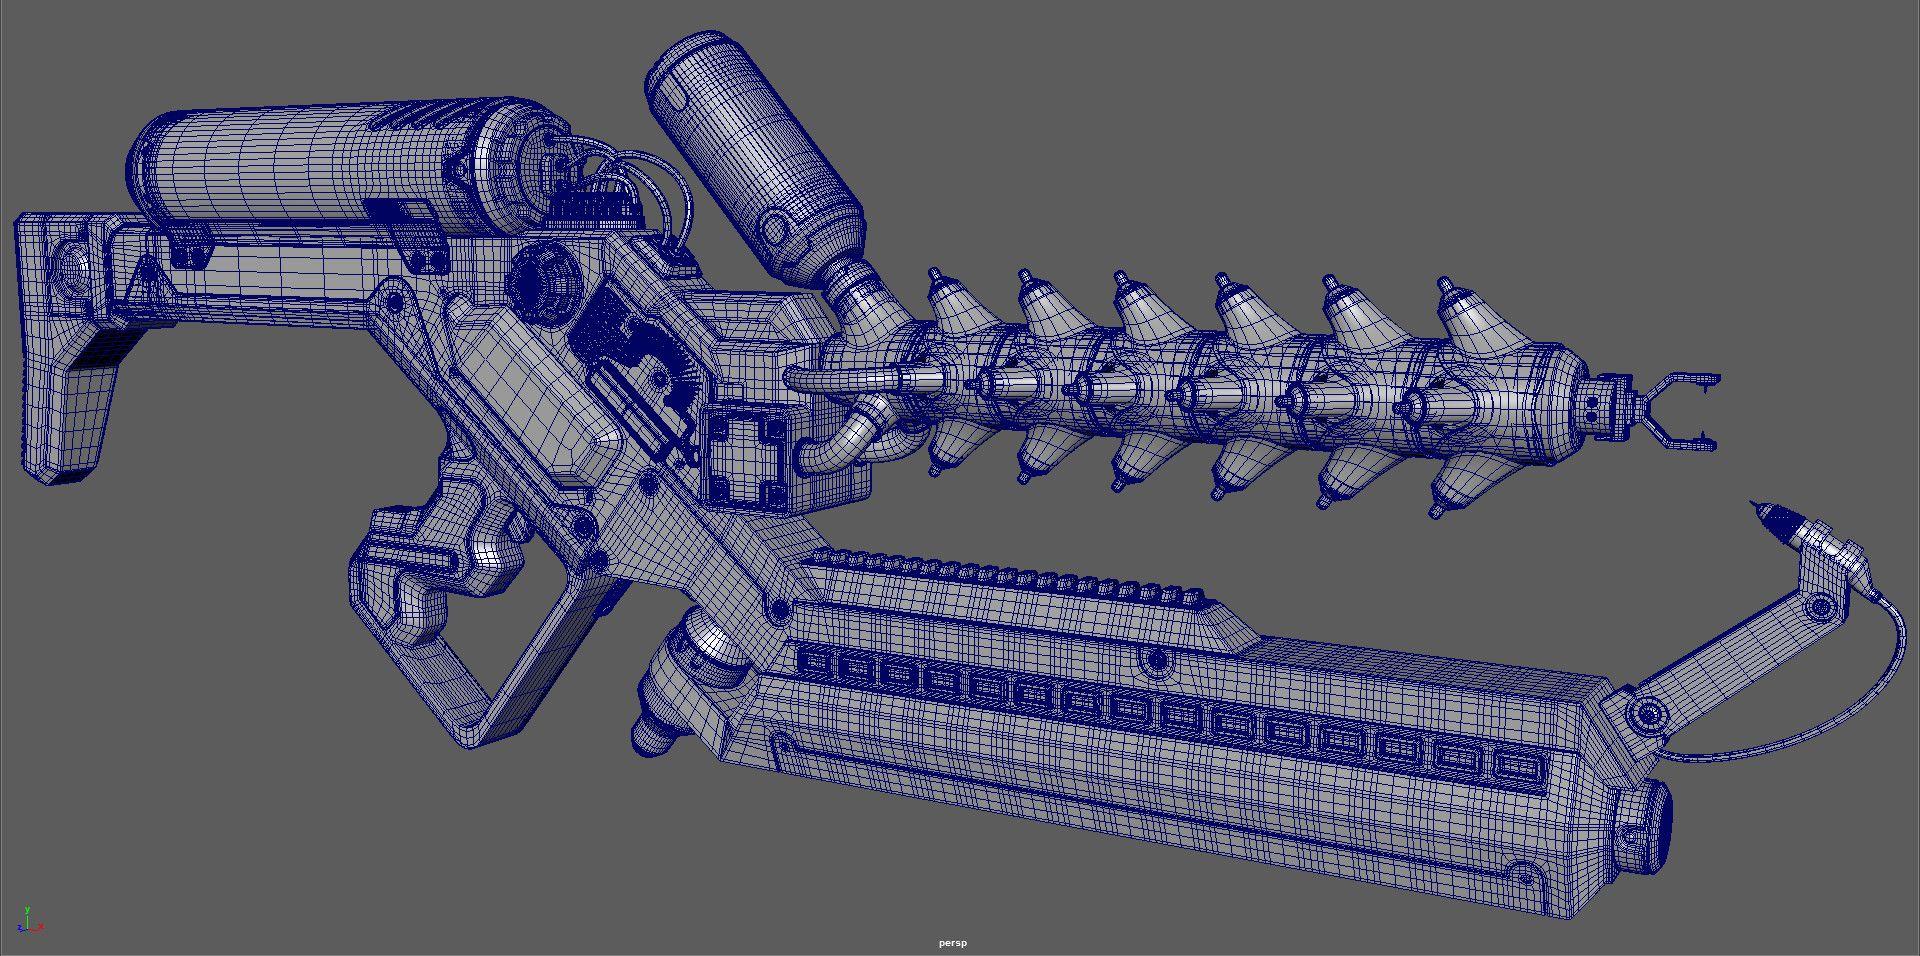 ArtStation - District 9 - Arc Gun, Giovanni Manili